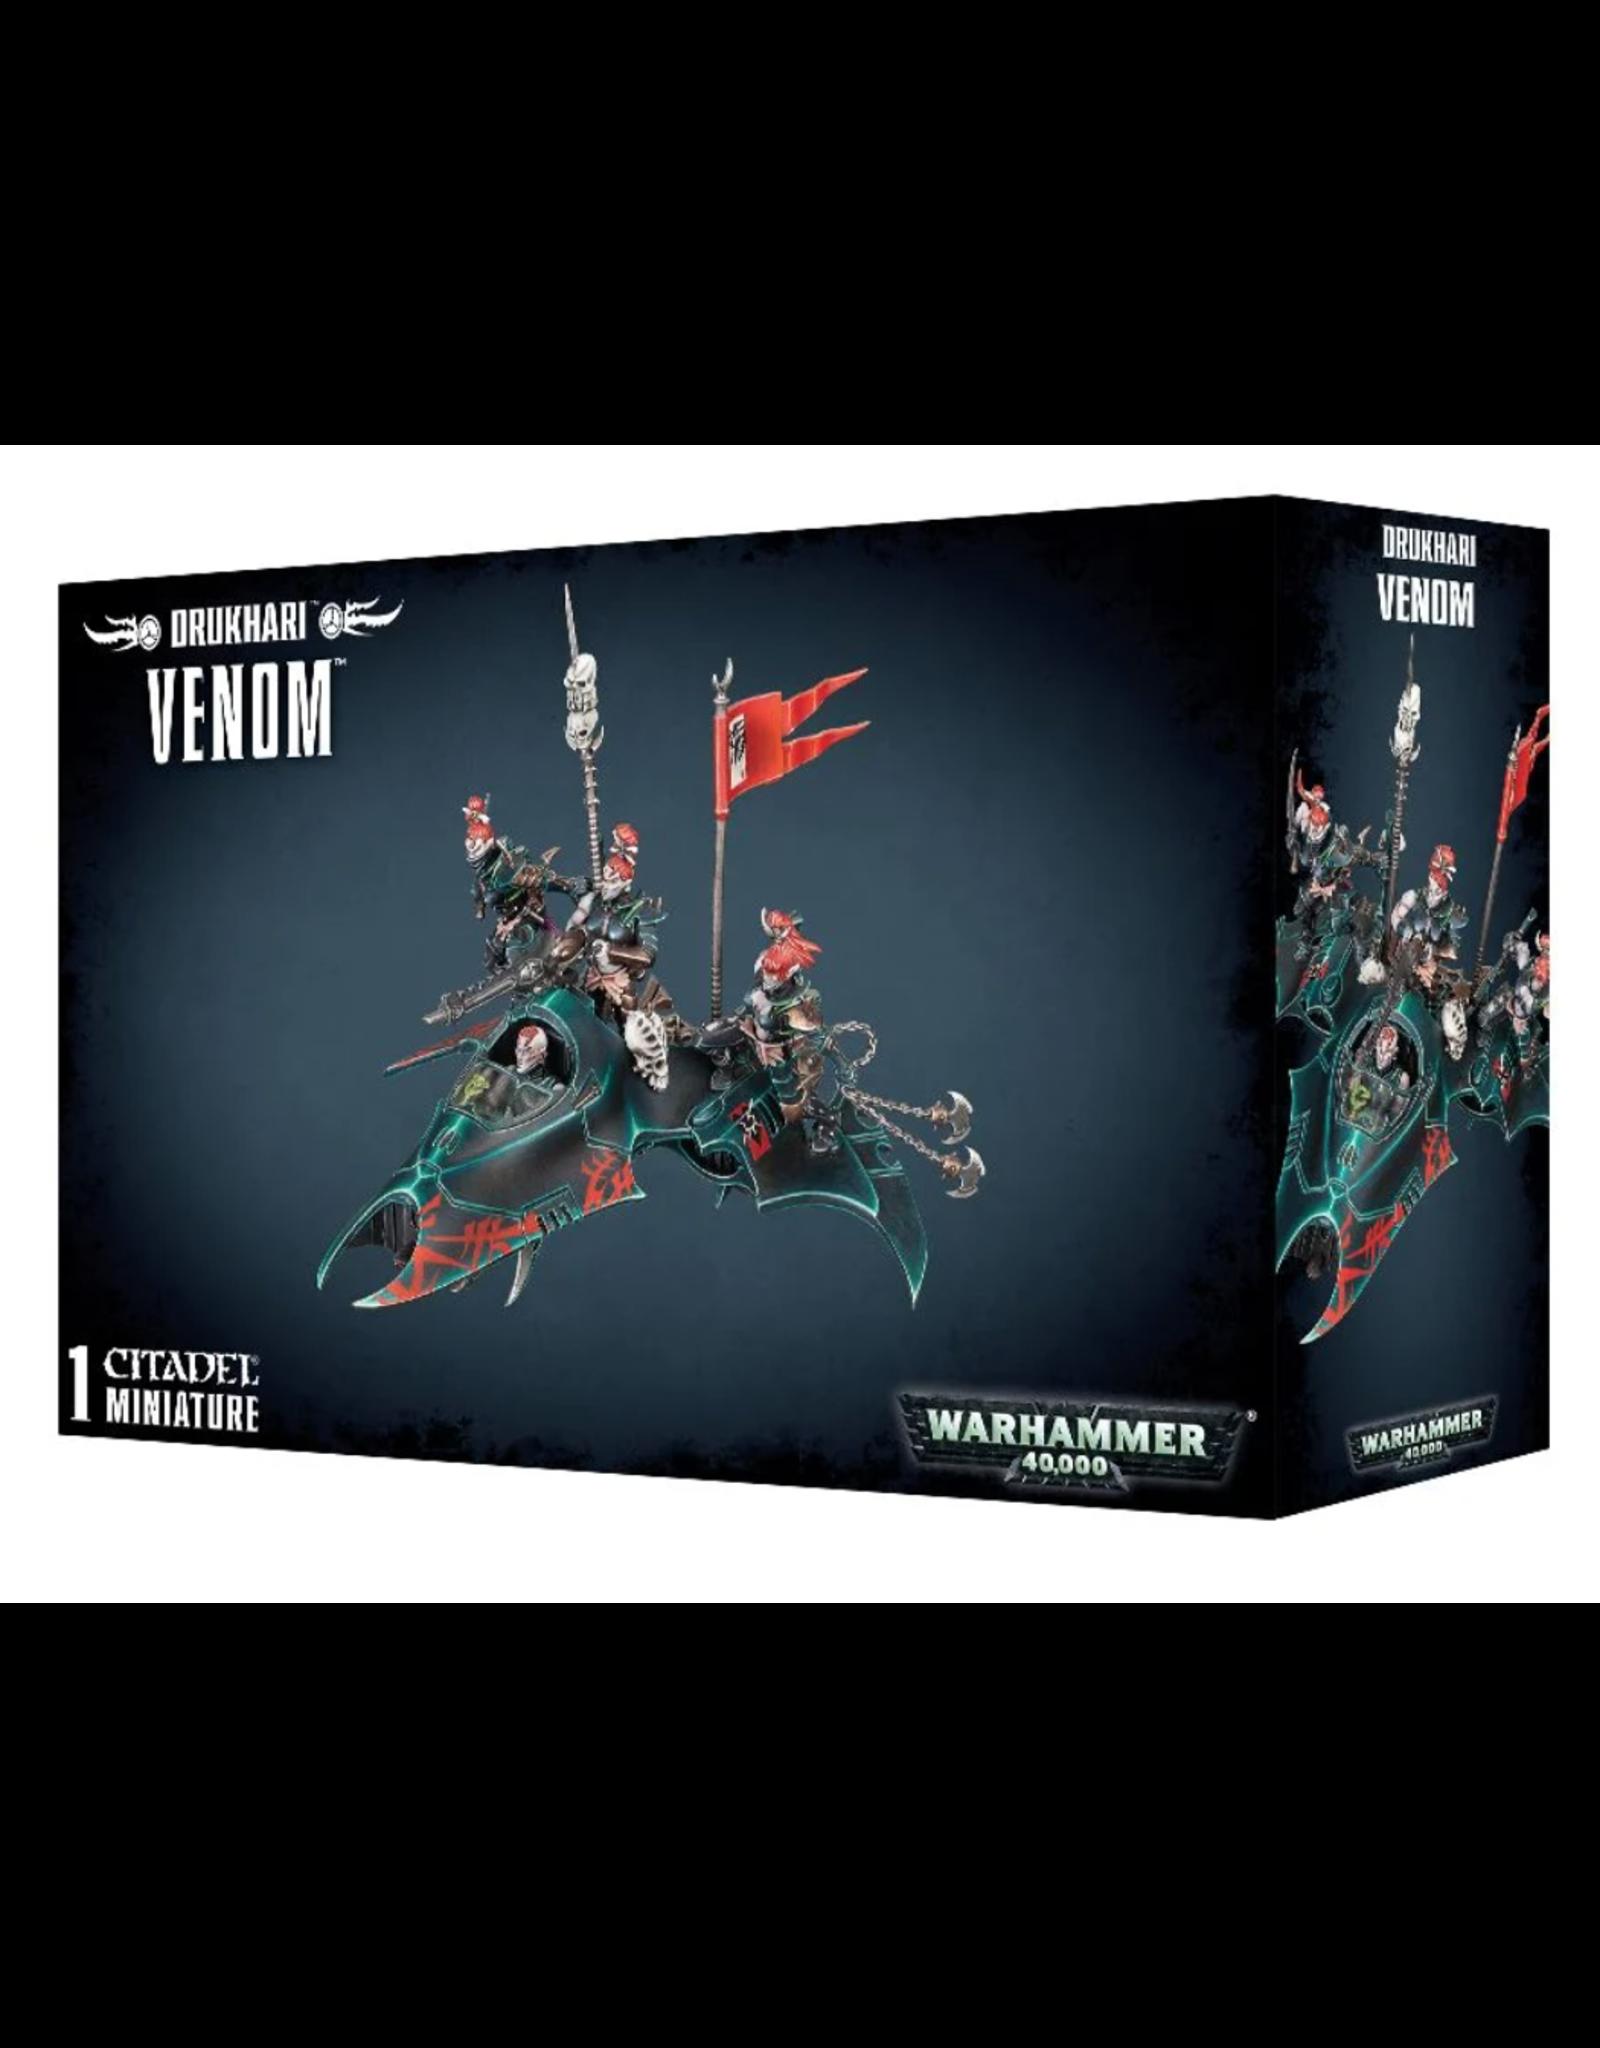 Warhammer 40K Drukhari Venom